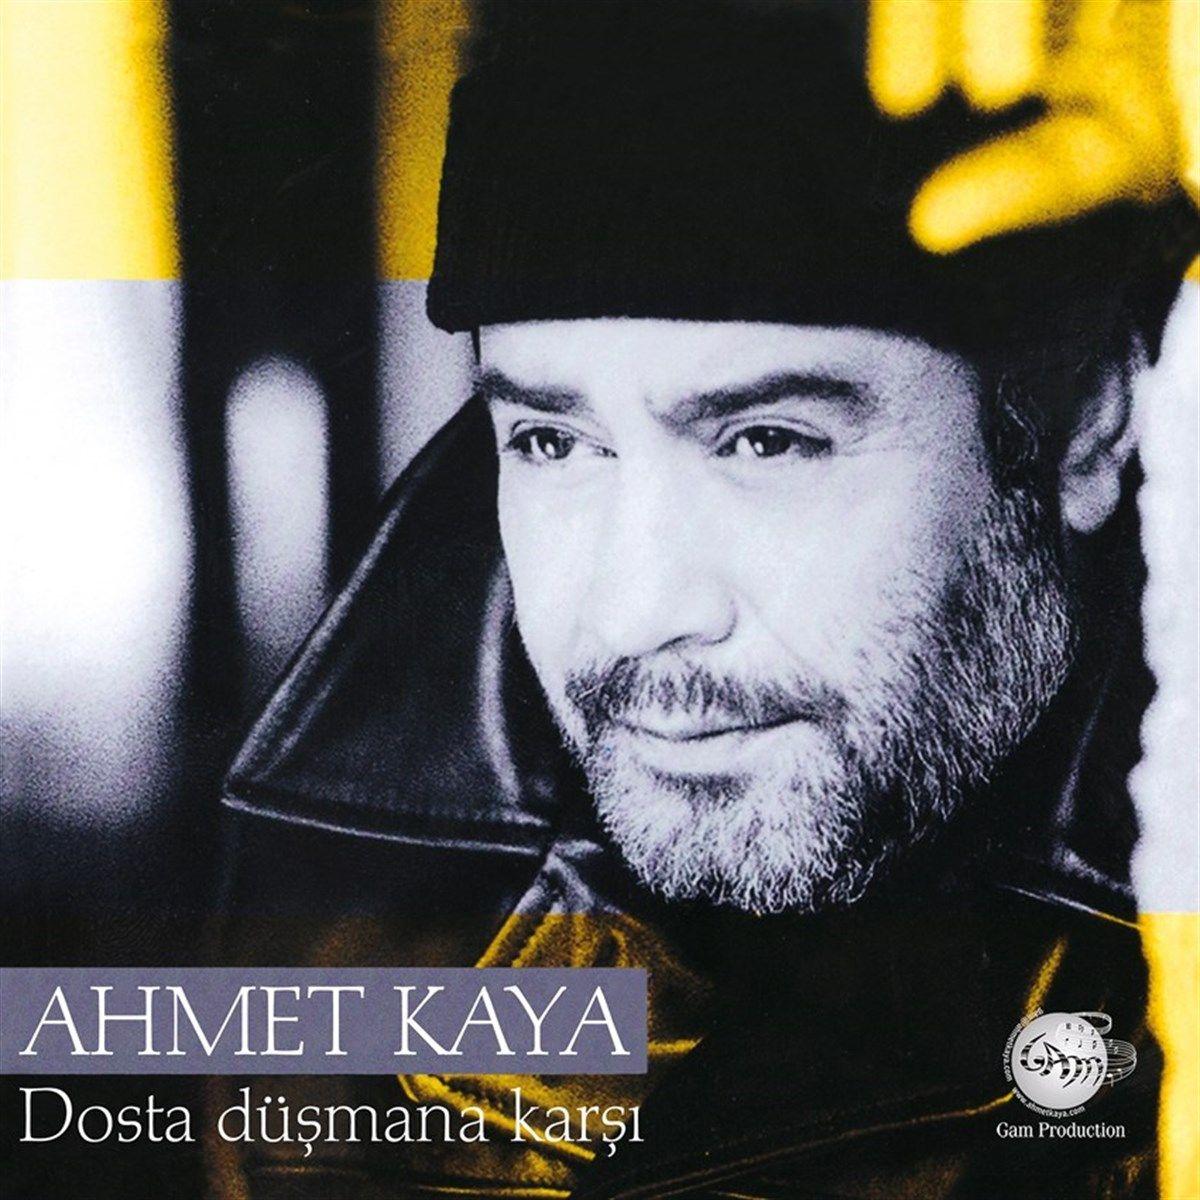 Ahmet Kaya Dosta Dusmana Karsi 2021 Sarkilar Muzik Vahsi Atlar